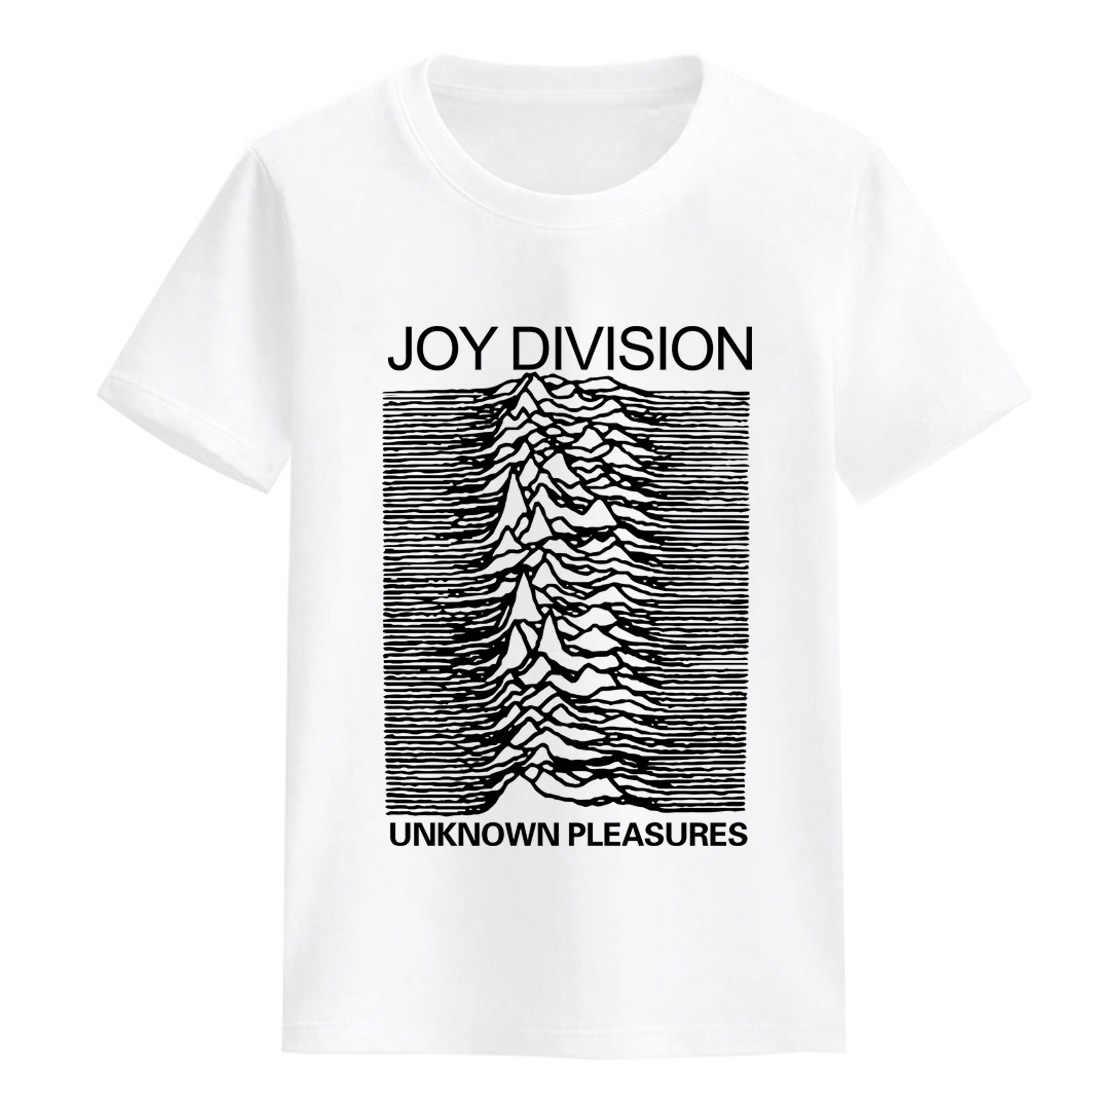 Camiseta Ropa Division Cuello Camisetas 100Algodón Niño Top Redondo Chica Niños De Corta 2018 Manga Para Joy Verano FK3lJcT1